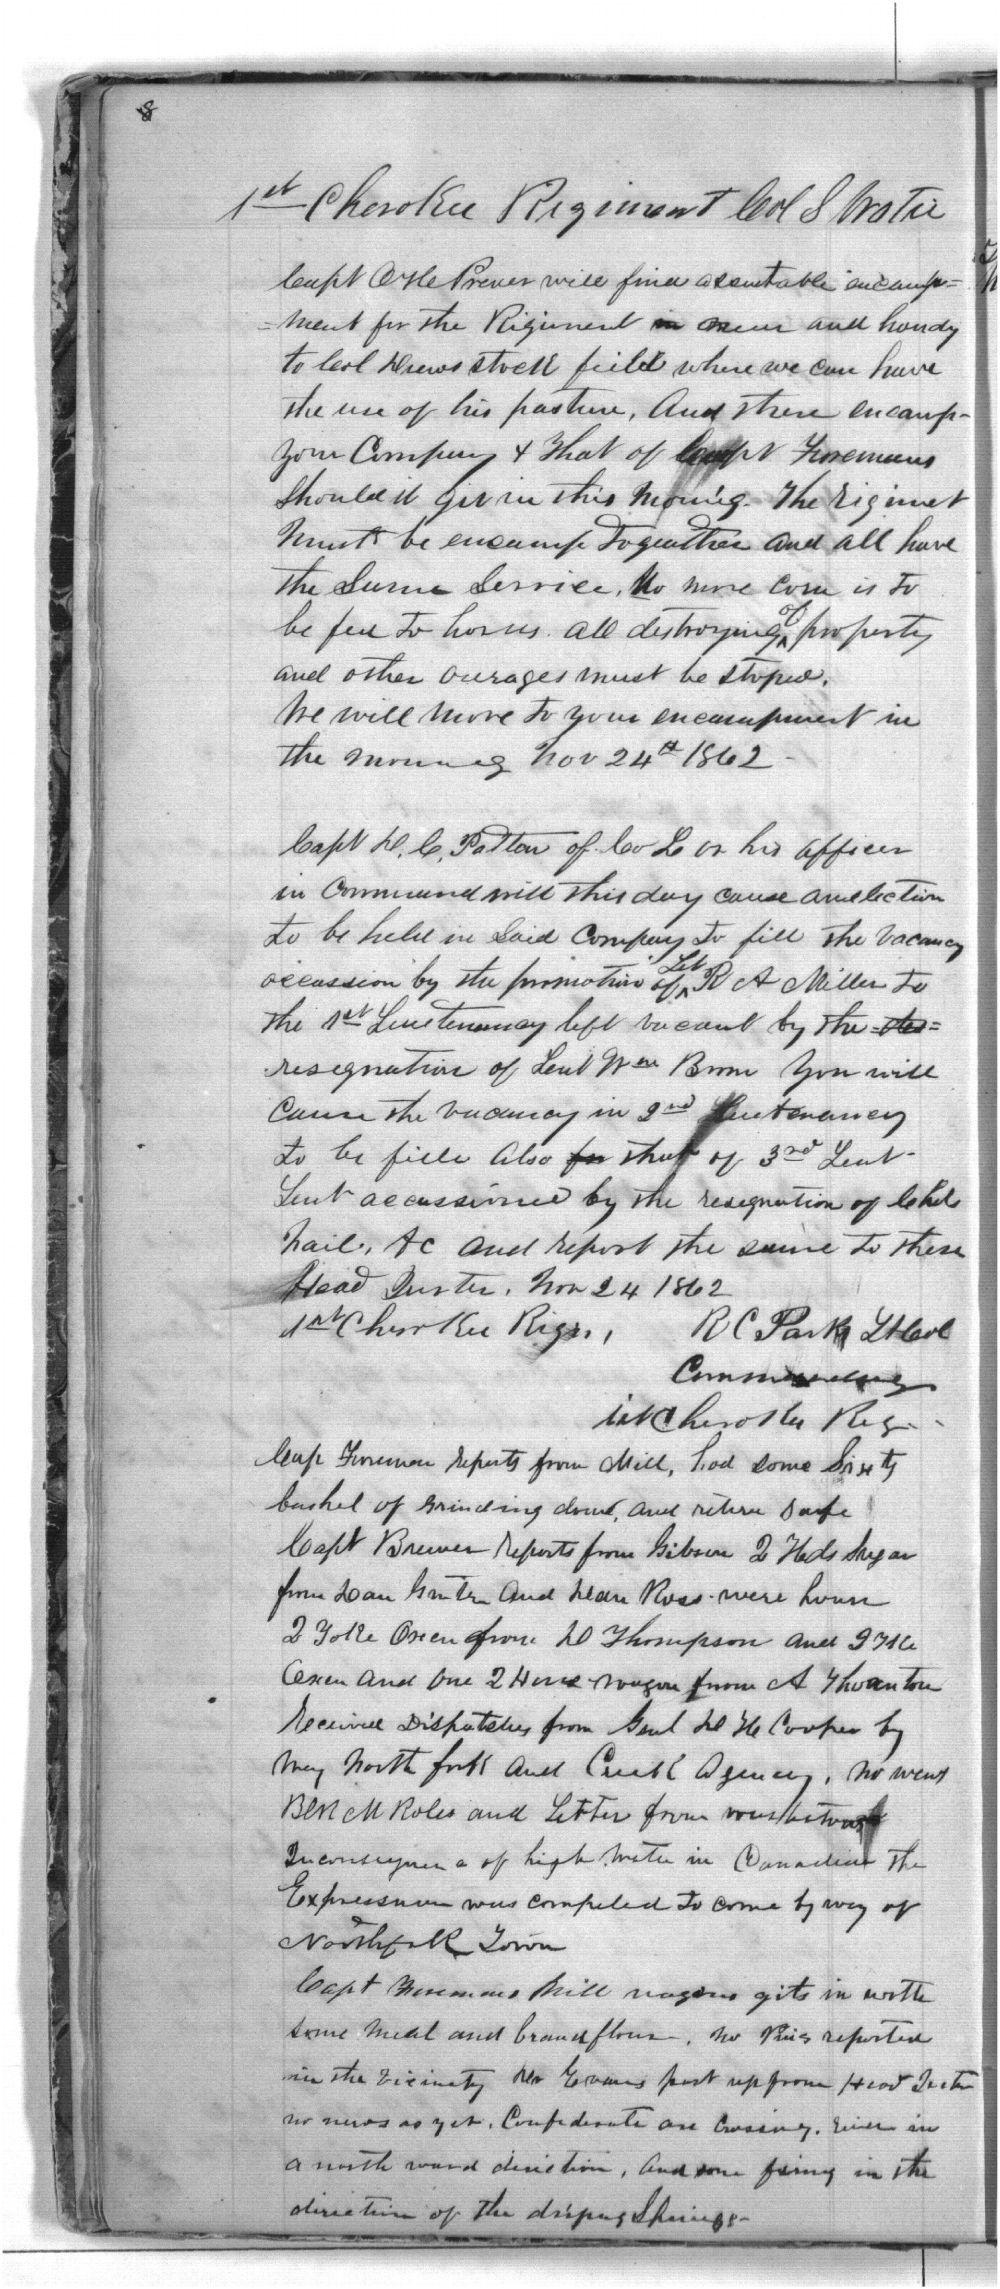 First Cherokee Regiment day book - 8